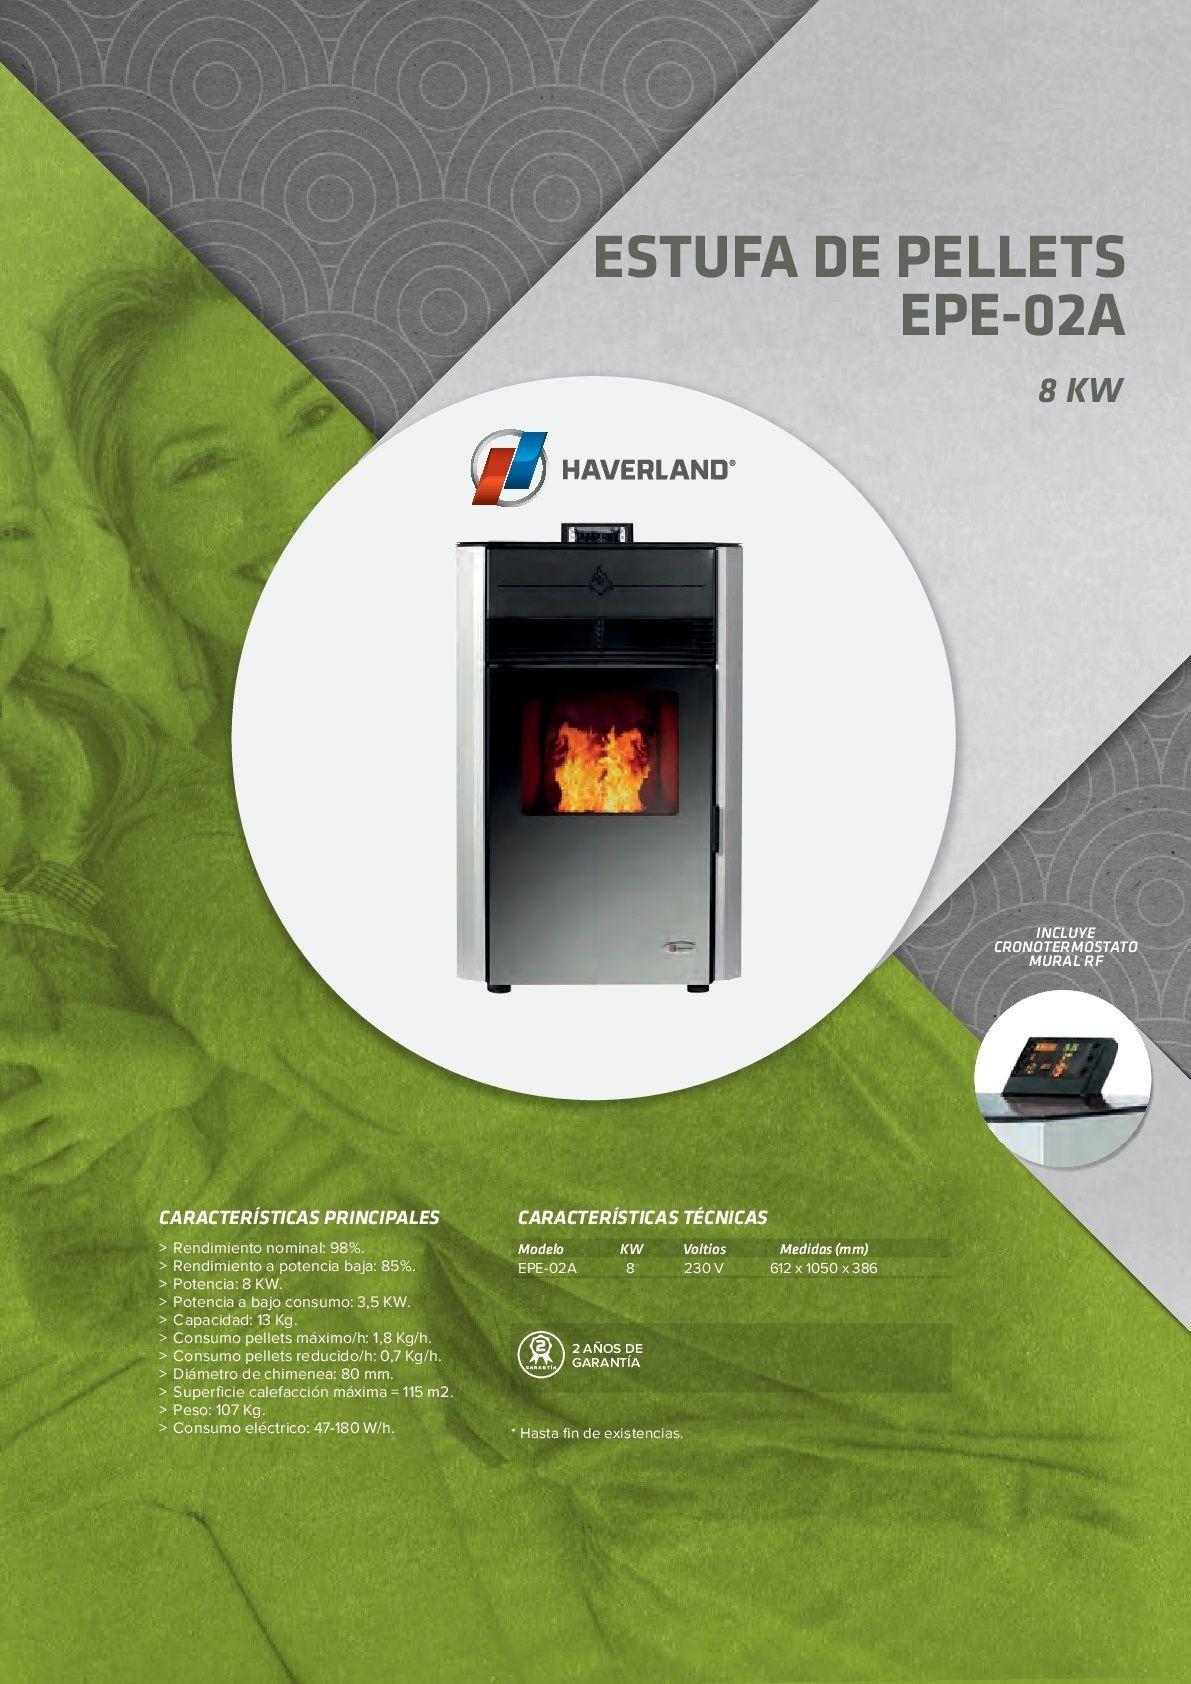 Ficha técnica EPE-02A